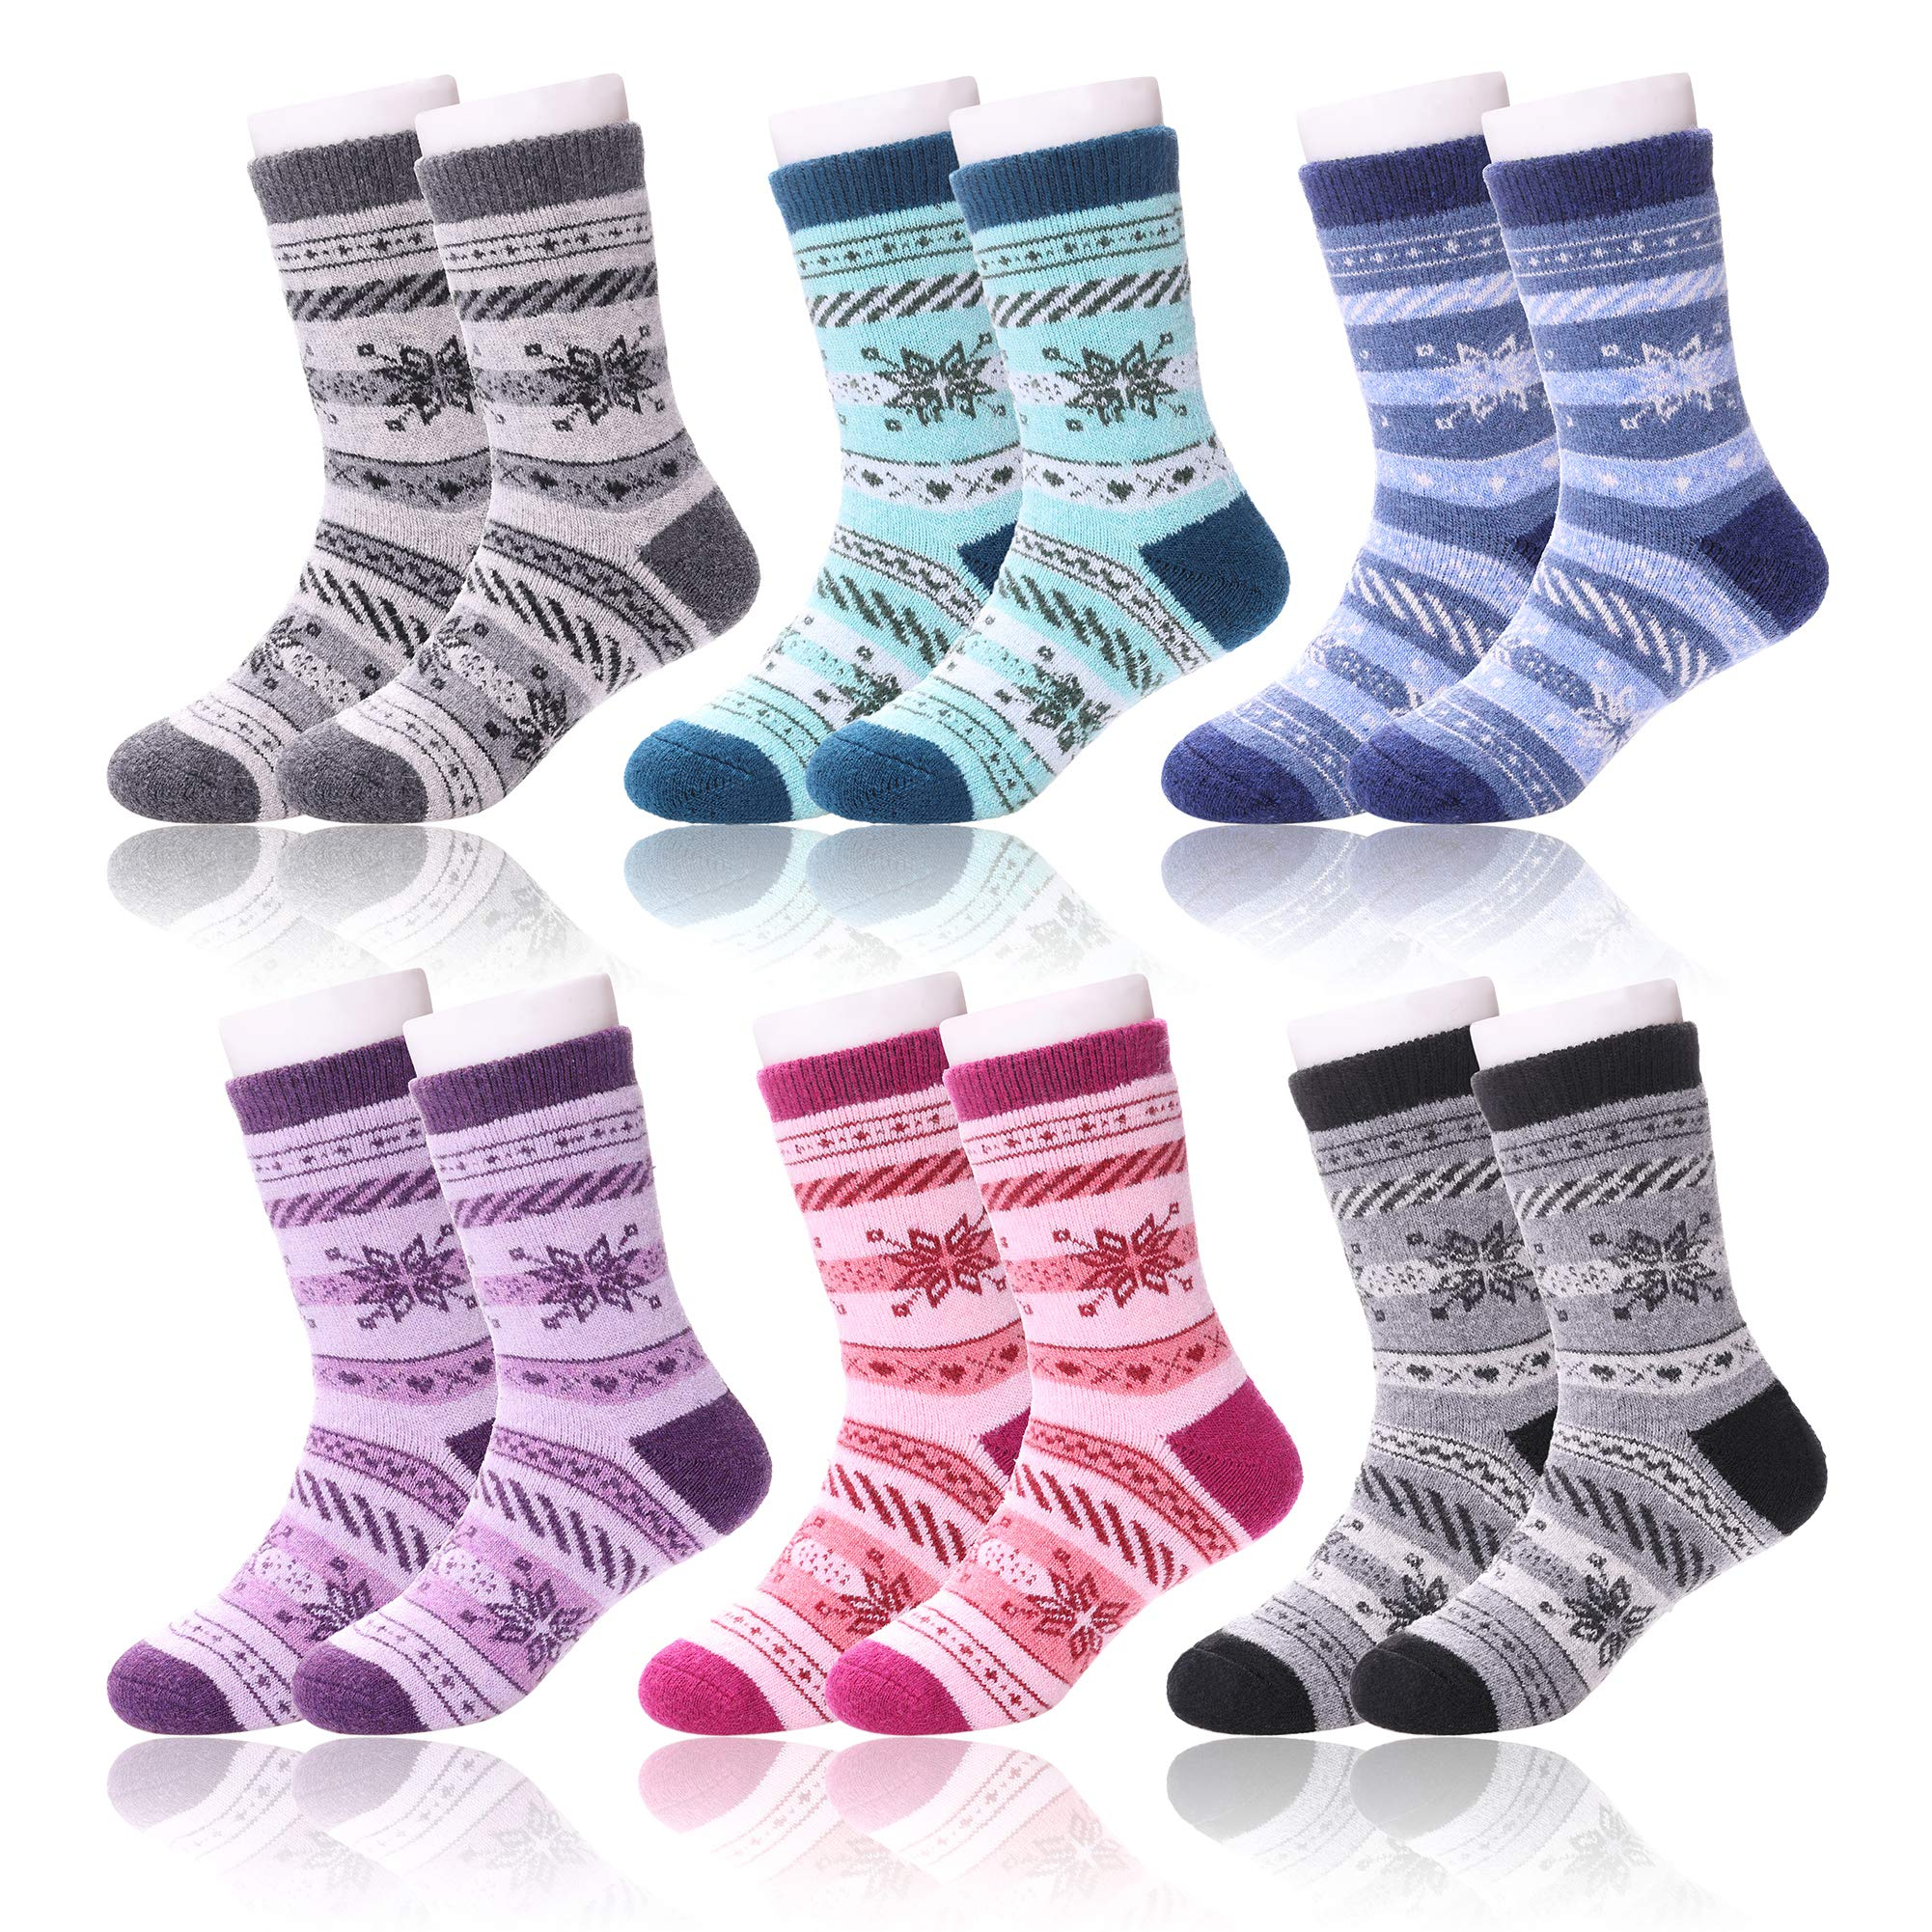 LANLEO 6 Pairs Childrens Winter Thick Warm Wool Socks Kids Boys Girls Cute Animal Crew Socks